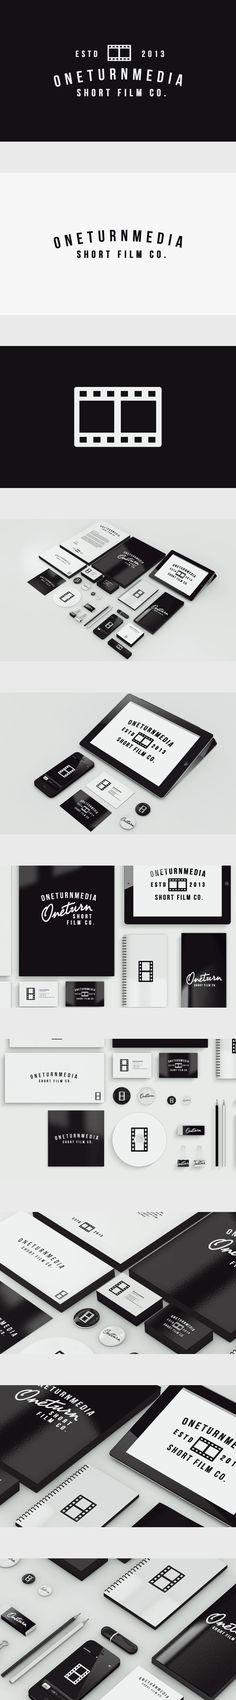 OneTurnMedia by Jørgen Grotdal, via Behance #branding #identity #stationary